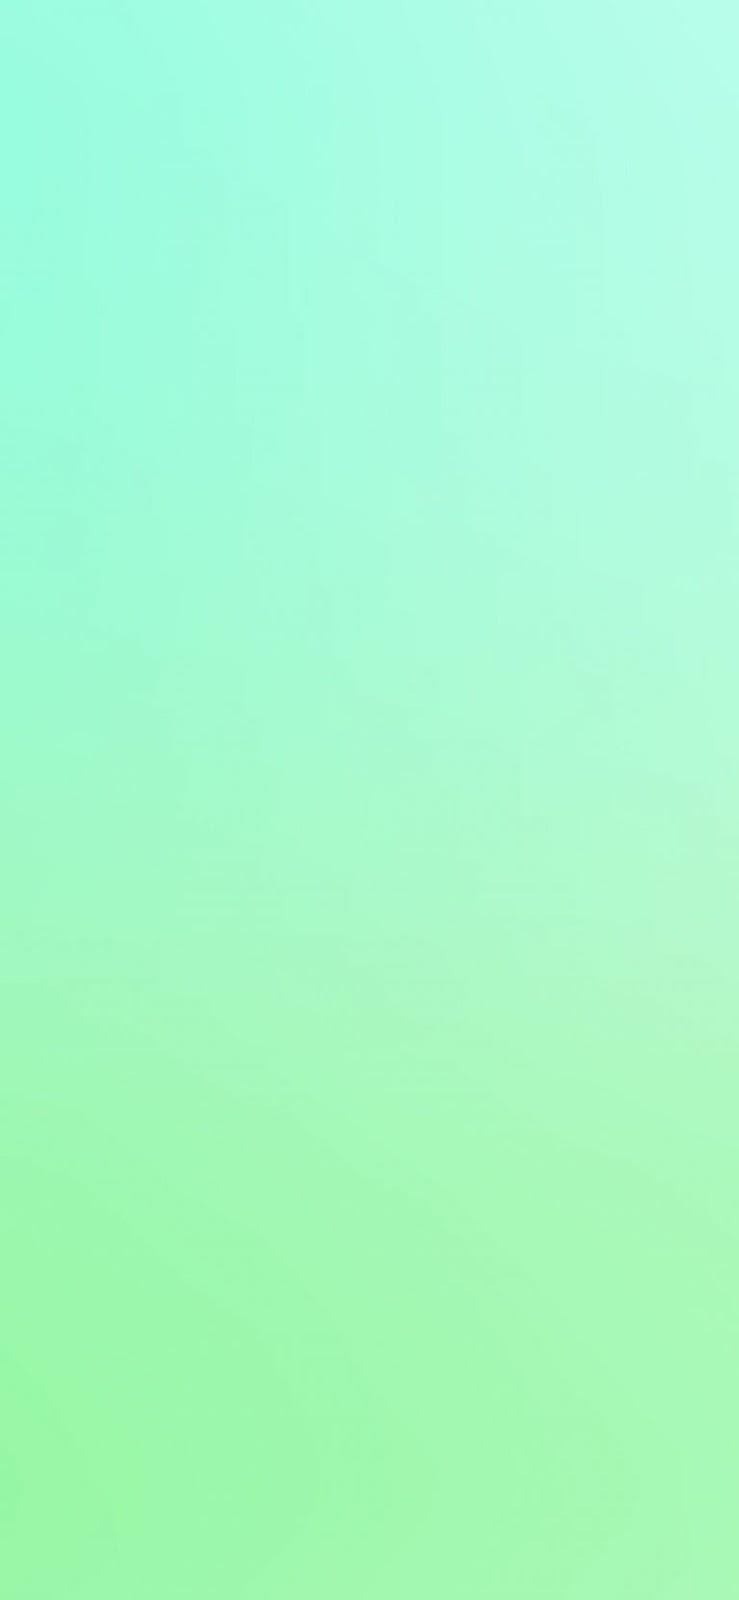 Iphone 11 Wallpaper Cool Pastel Blur Gradation Mint Green Iphone X 768x1663 Ombre Wallpaper Iphone Pink Ombre Wallpaper Blue Wallpaper Phone